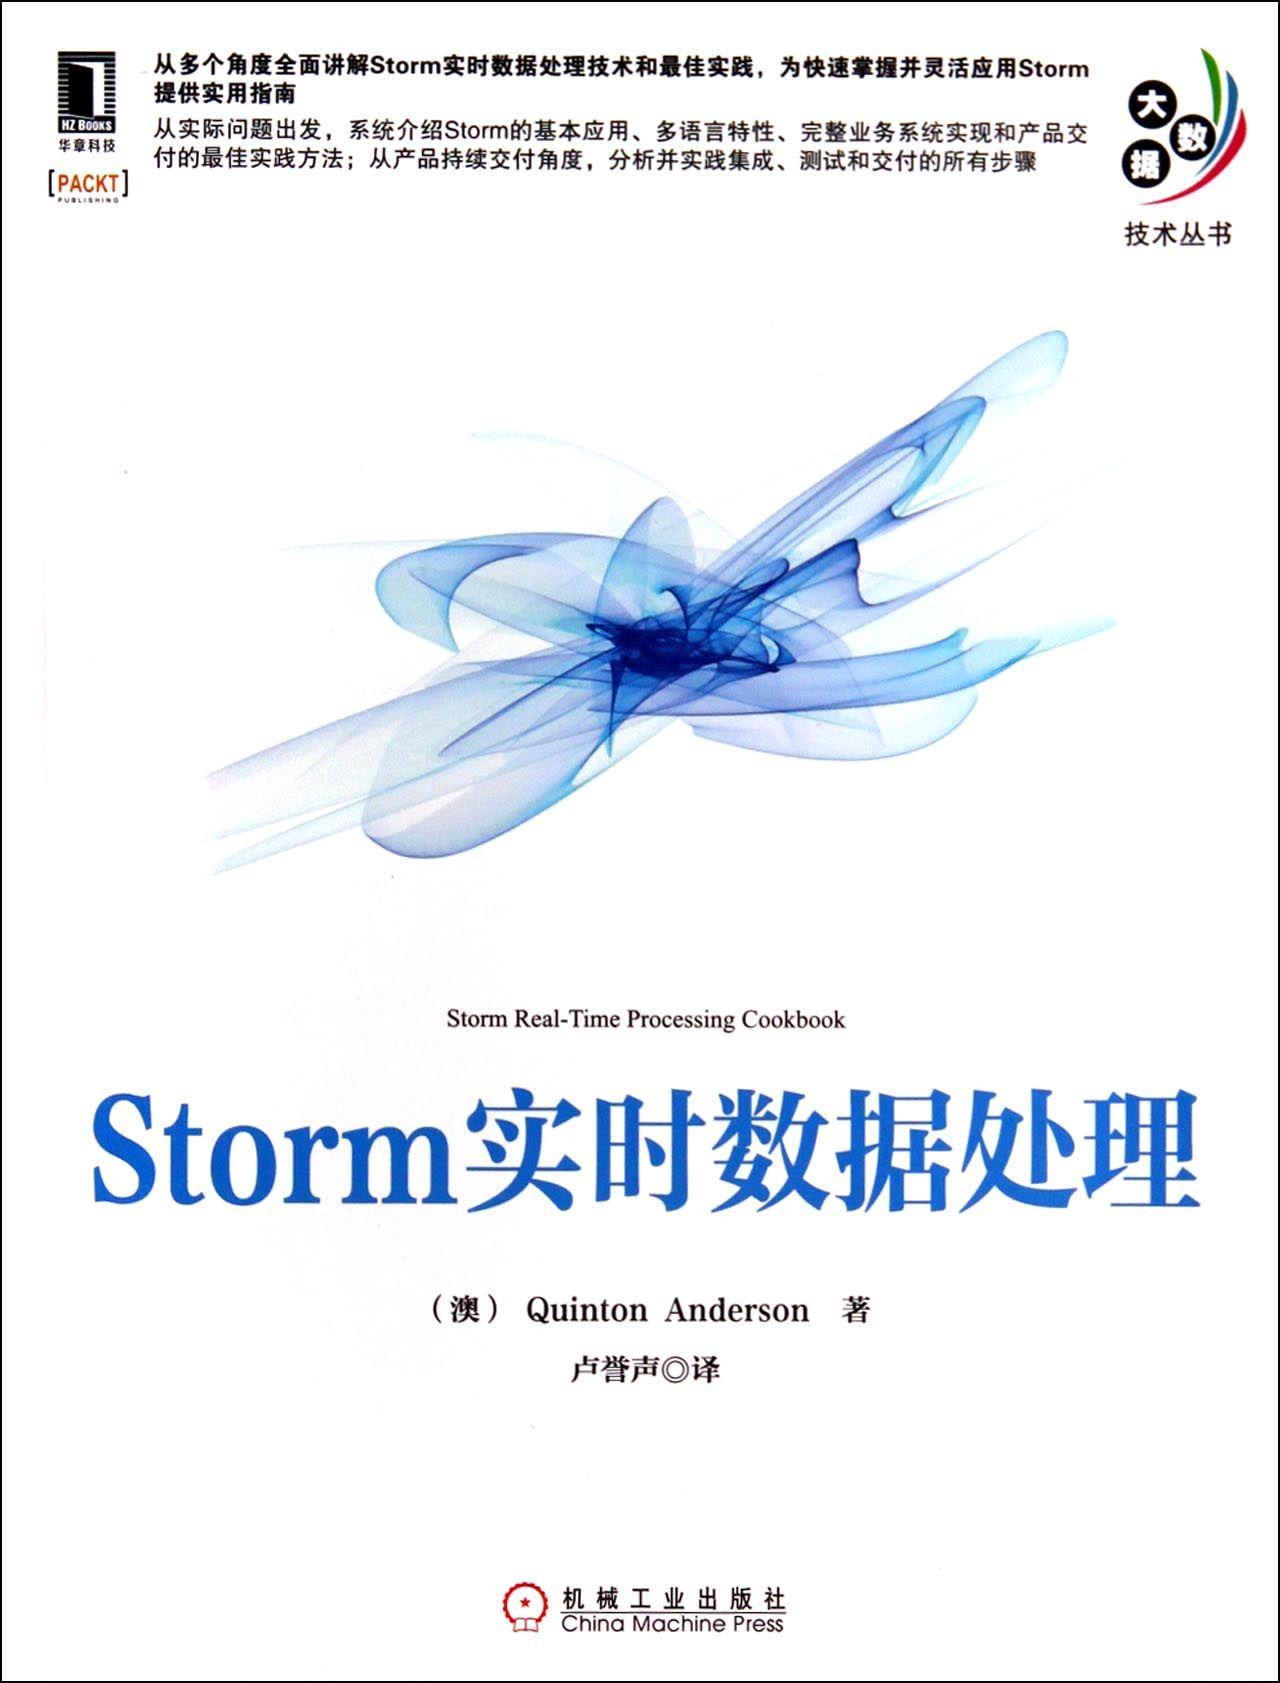 Storm 實時數據處理